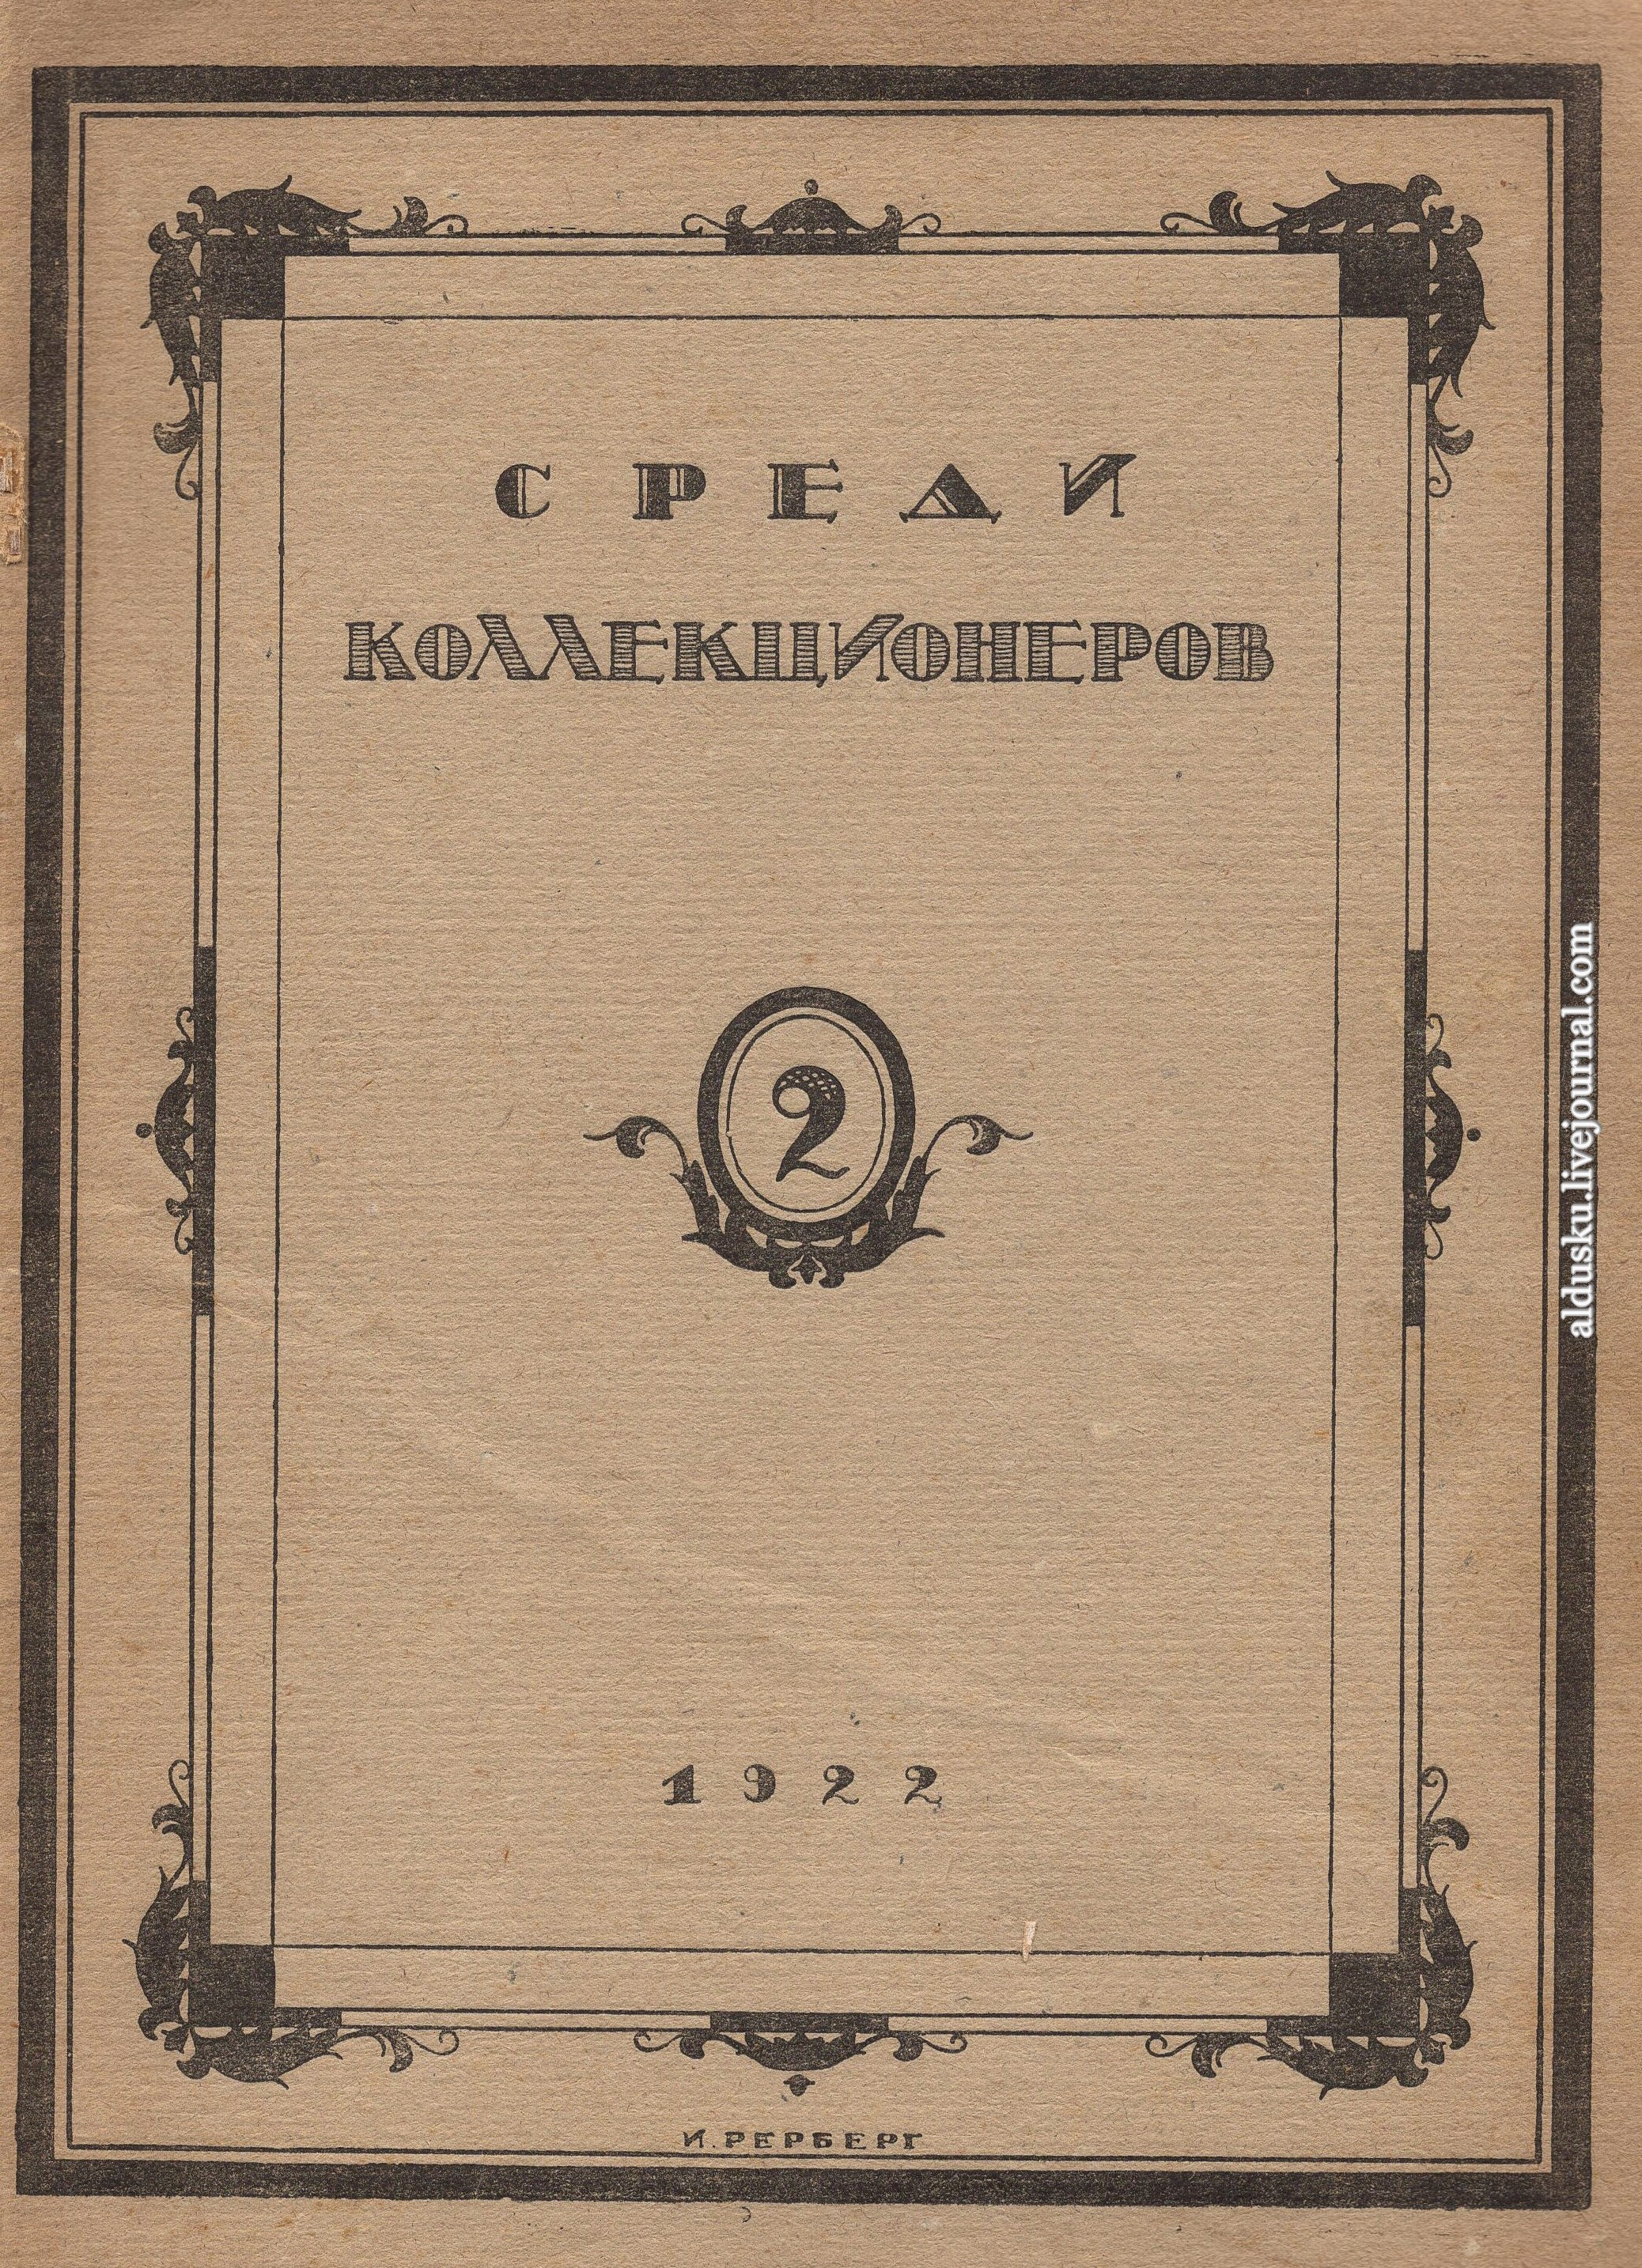 Среди коллеционеров 1922